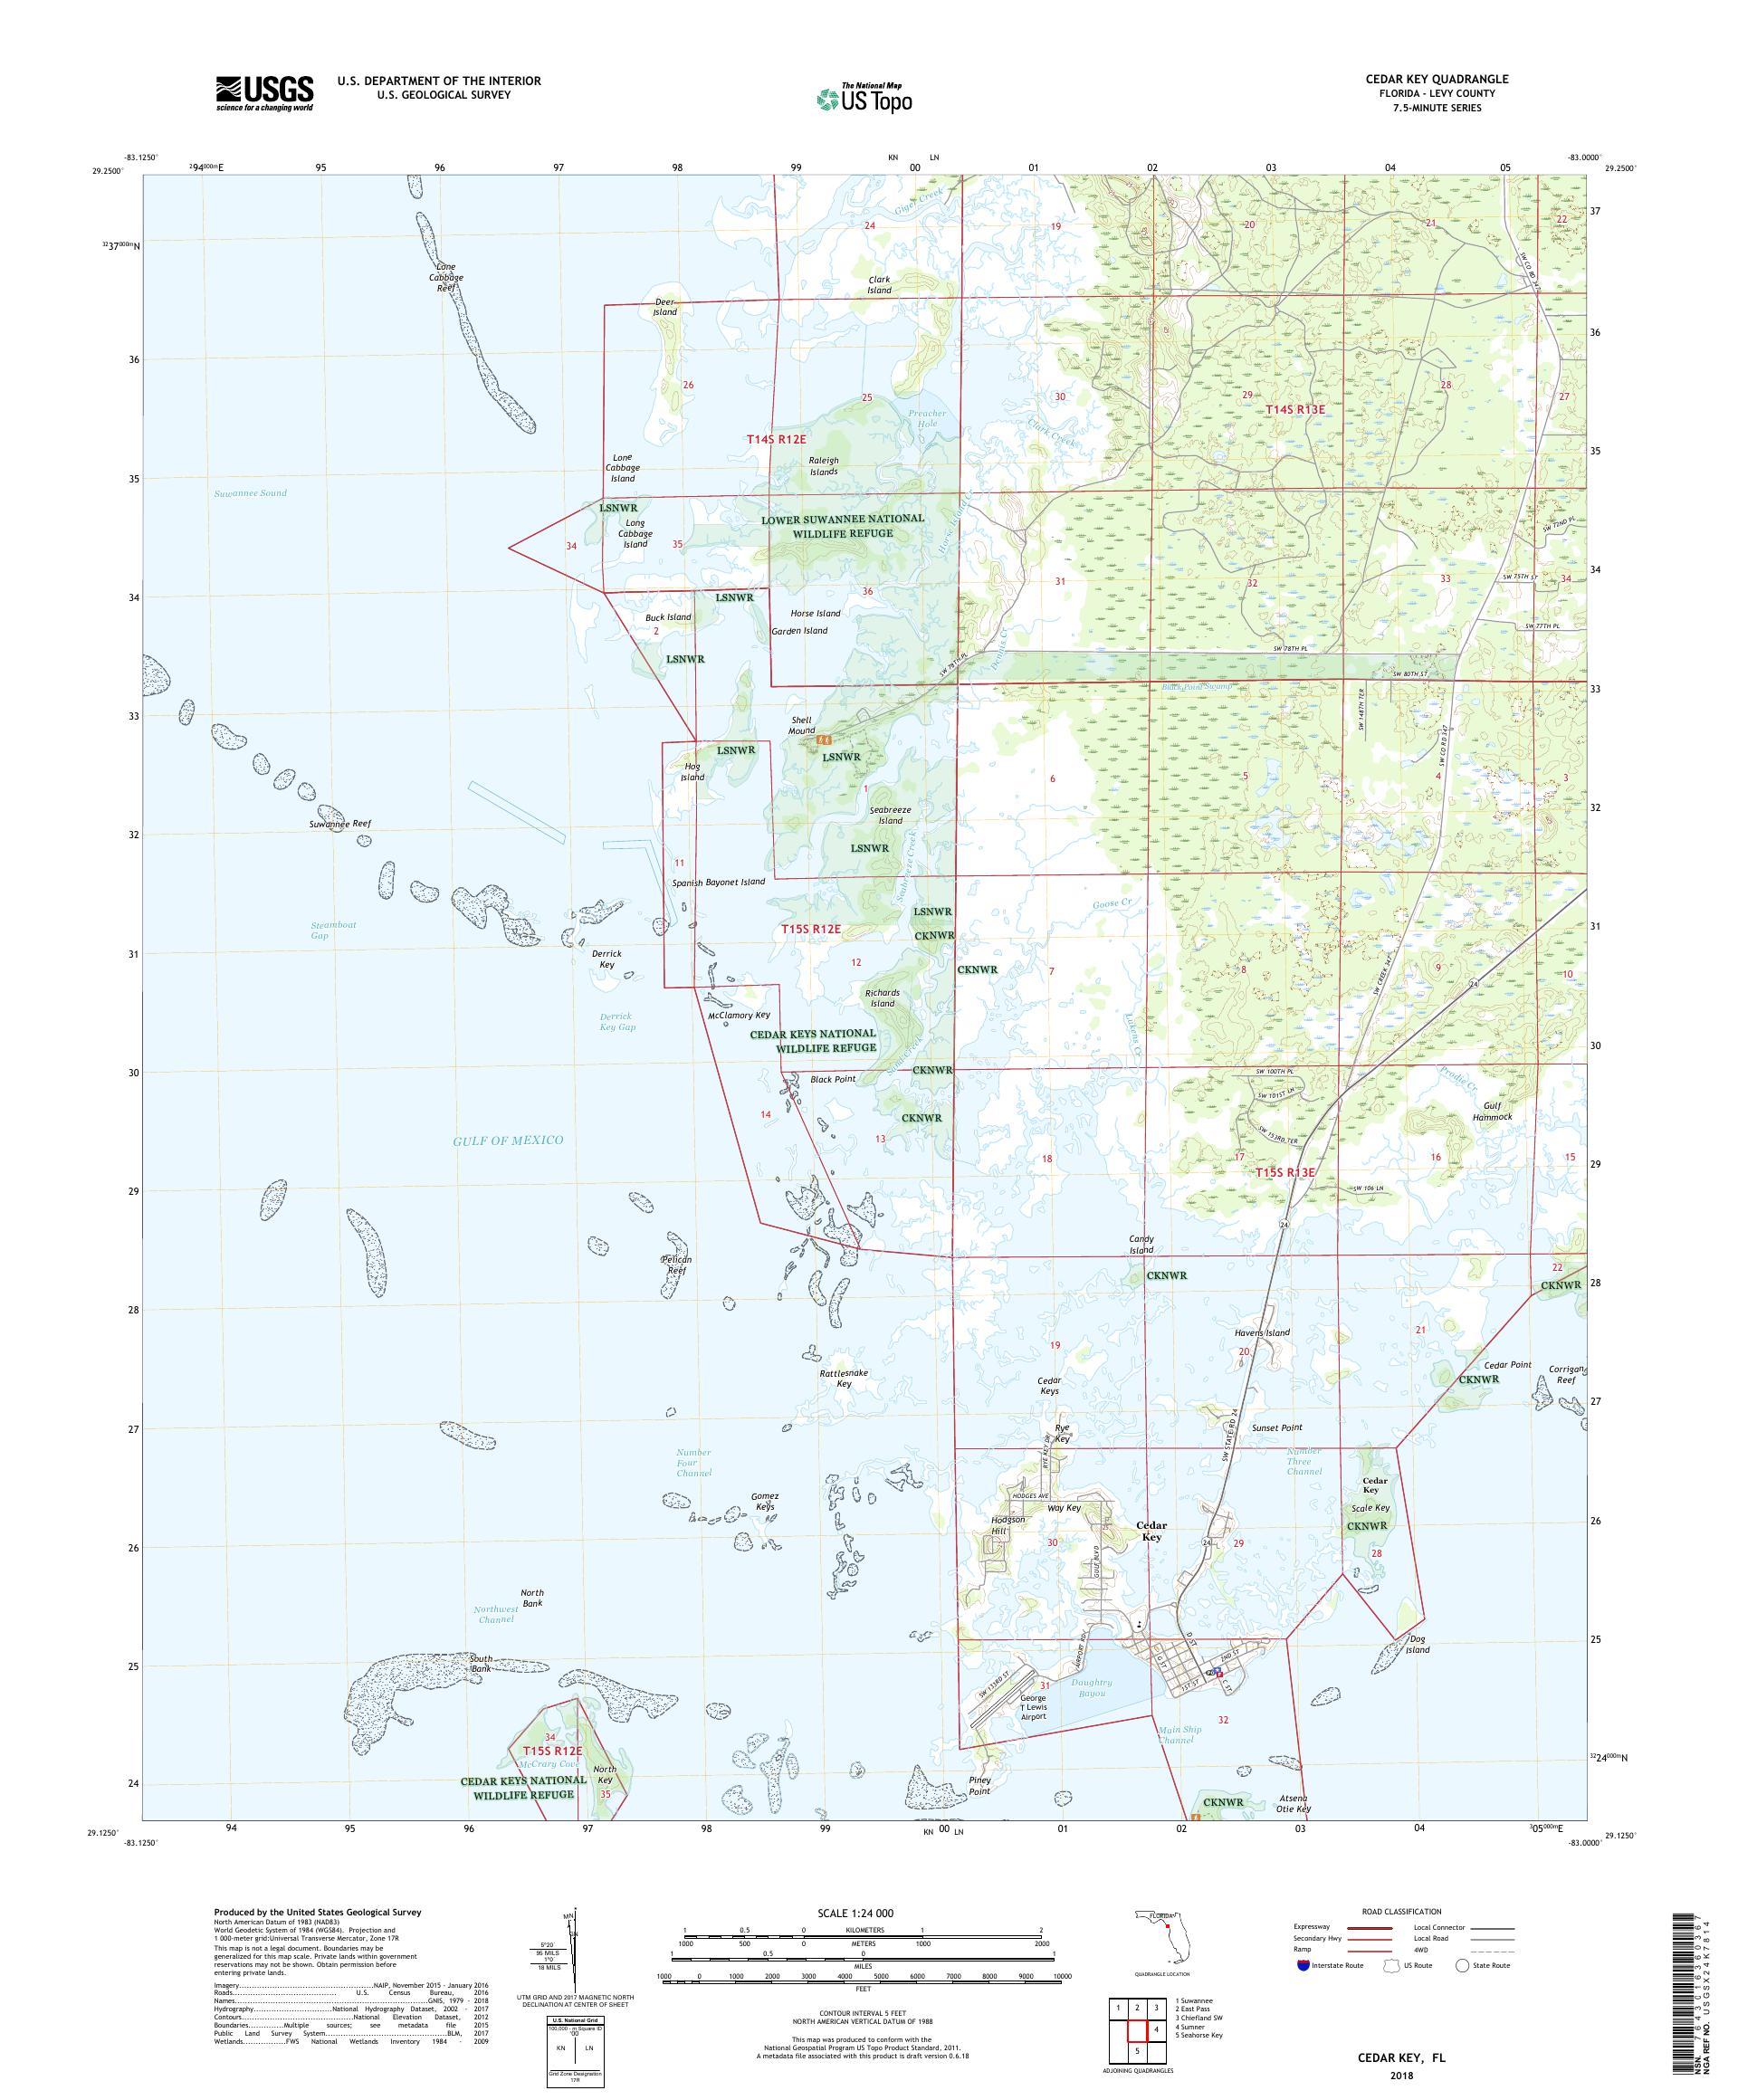 MyTopo Cedar Key, Florida USGS Quad Topo Map on